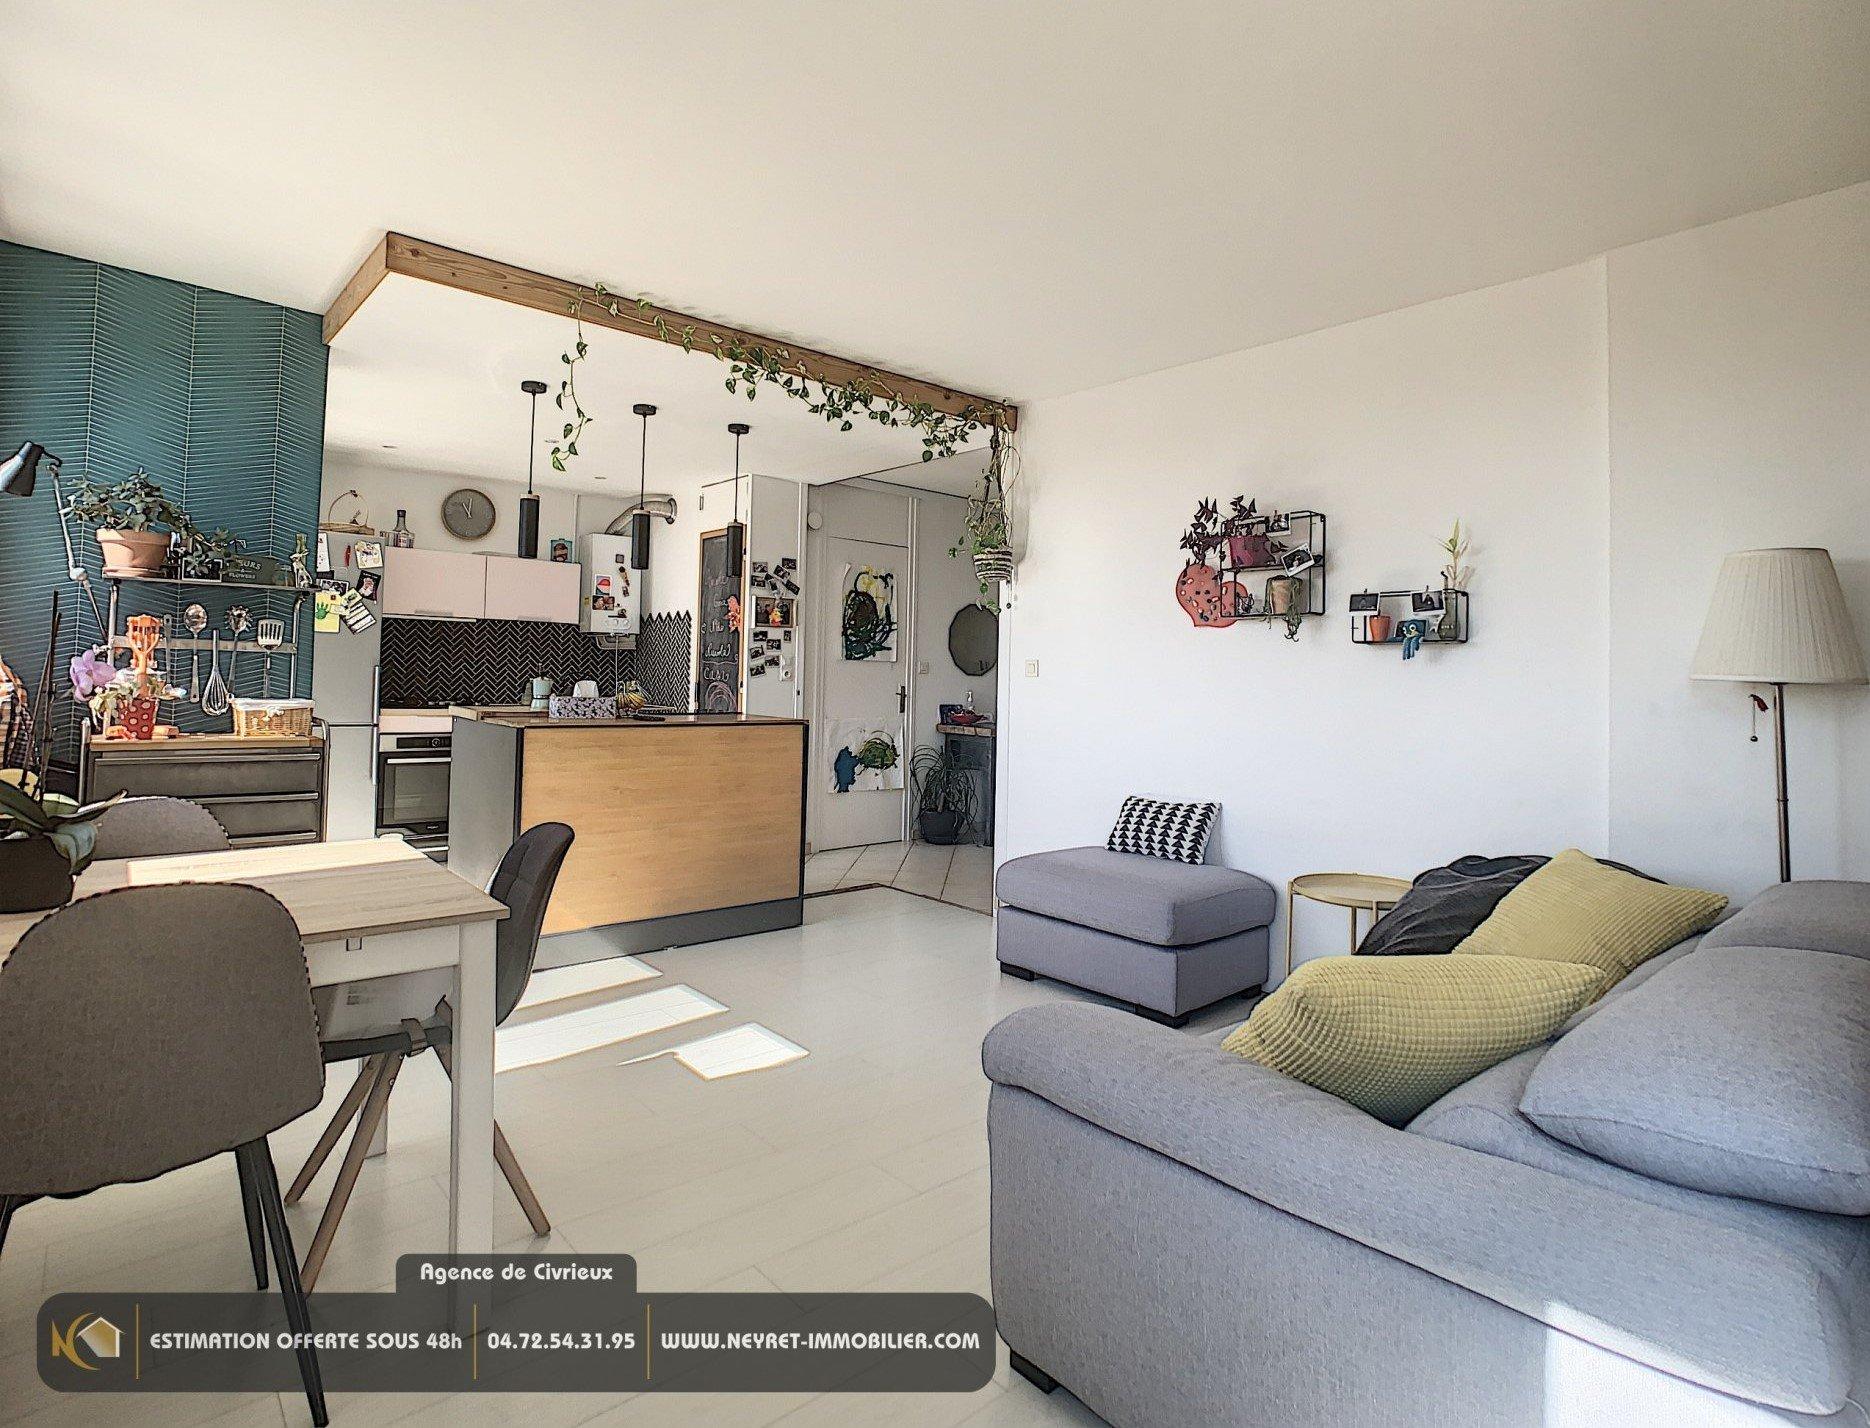 Appartement T3 DERNIER ETAGE 65 m²